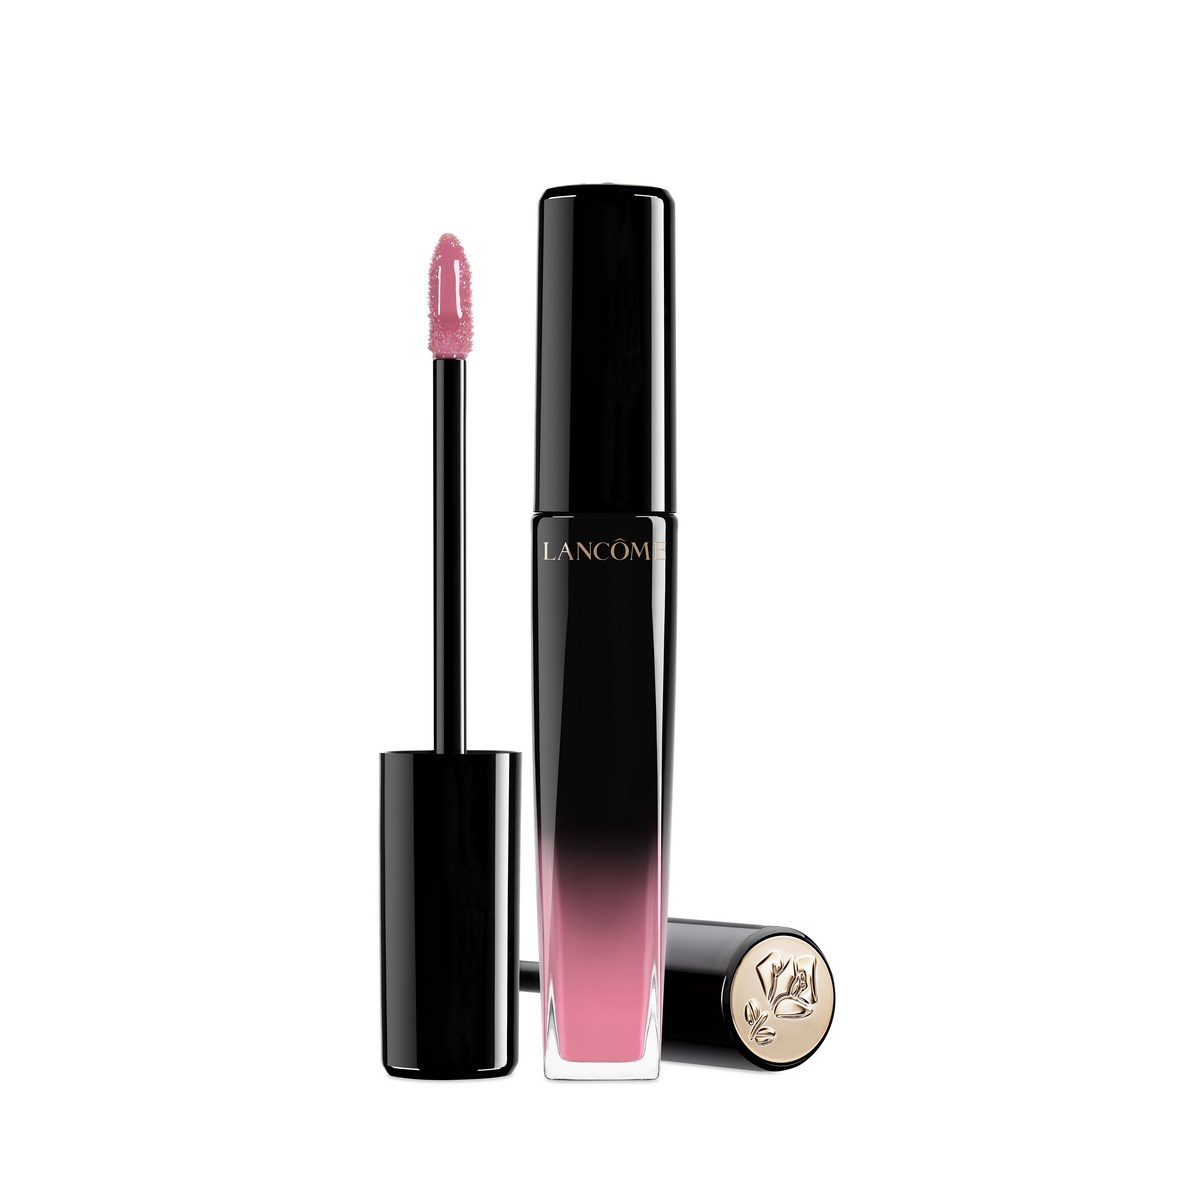 Lancôme L'Absolu Lacquer Lipstick First Date 312